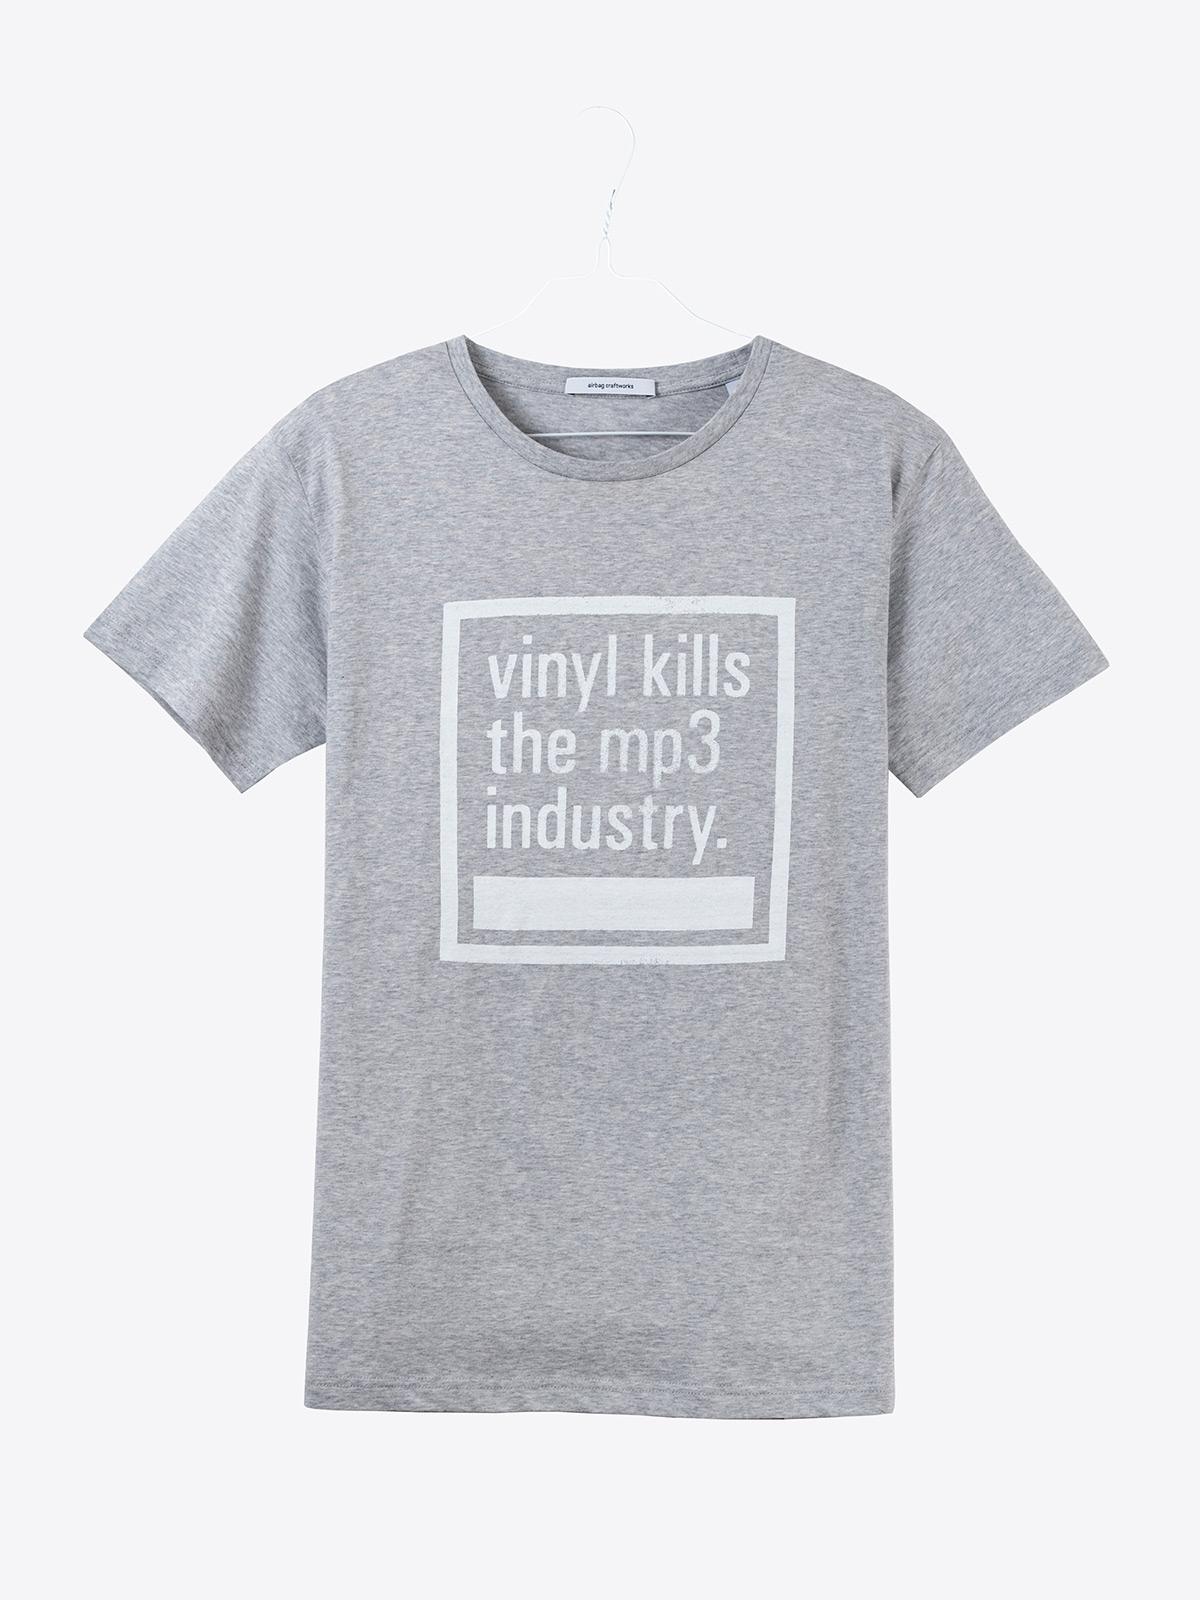 airbag craftworks vinyl kills the mp3 industry